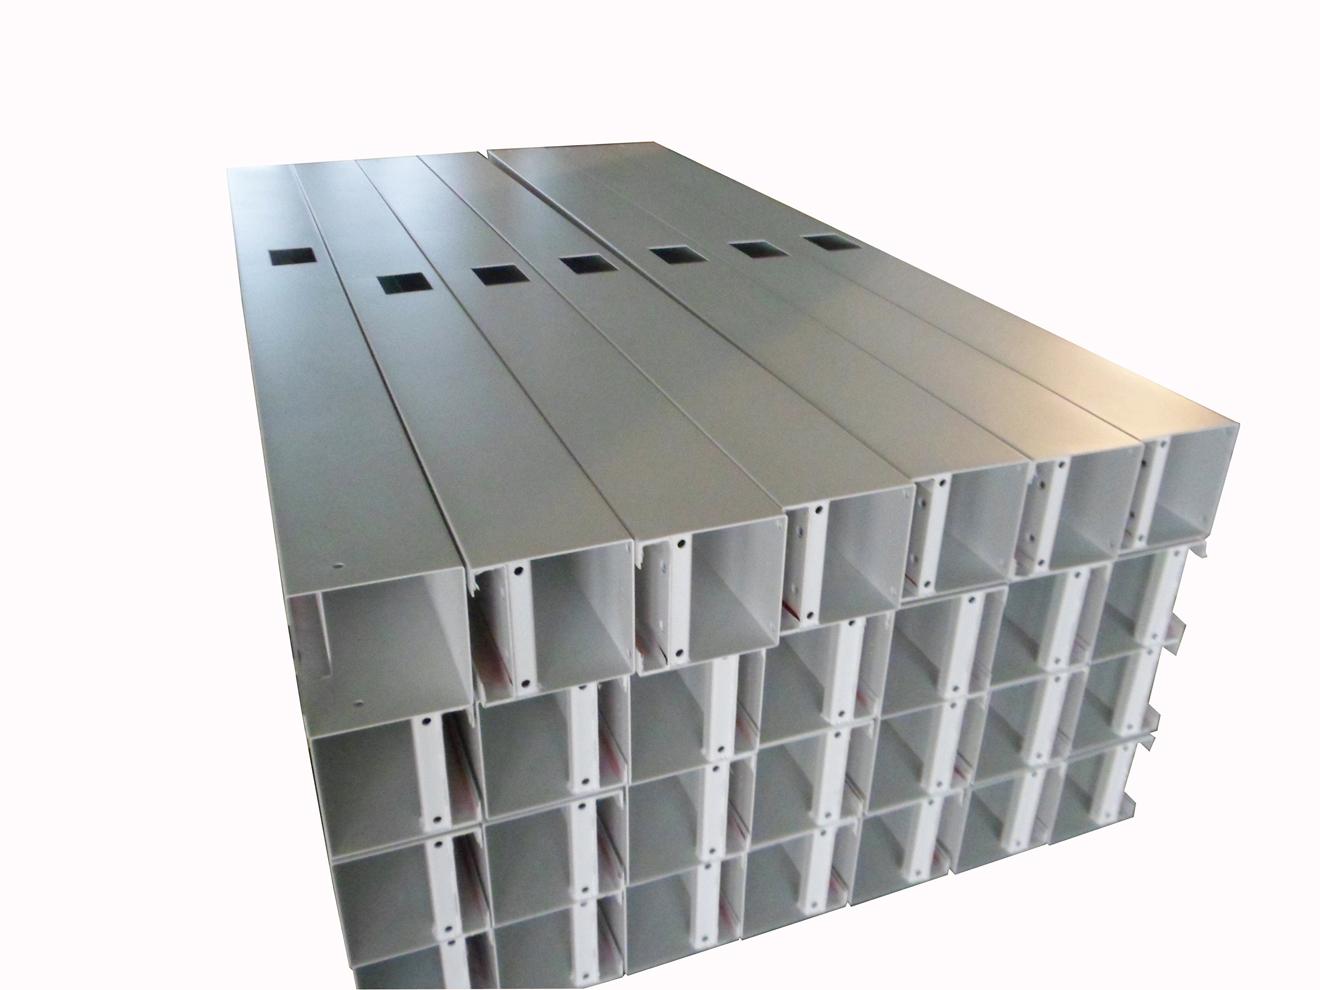 x光机配件制造|机箱机柜钣金件|创兴钣金定制热线:40